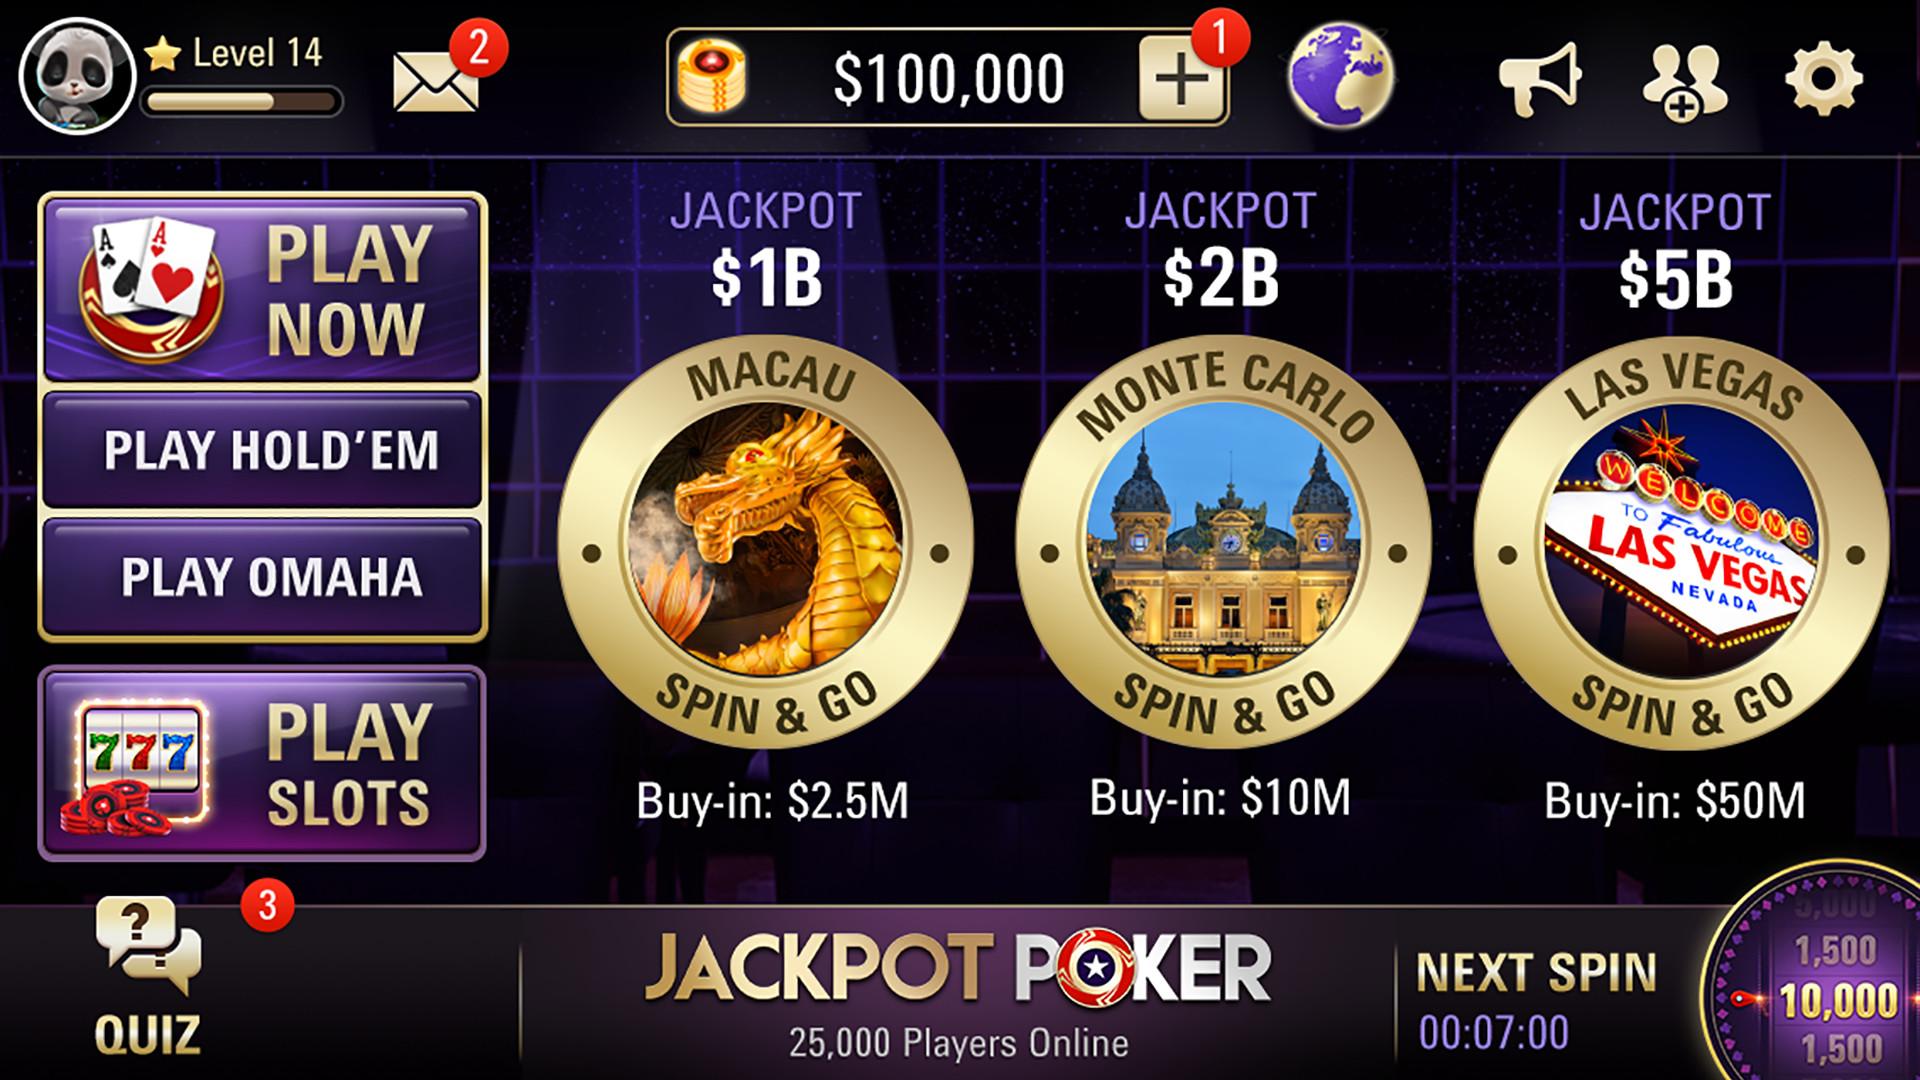 Lincecia de All Jackpots casino pokerstars dinero real-574964